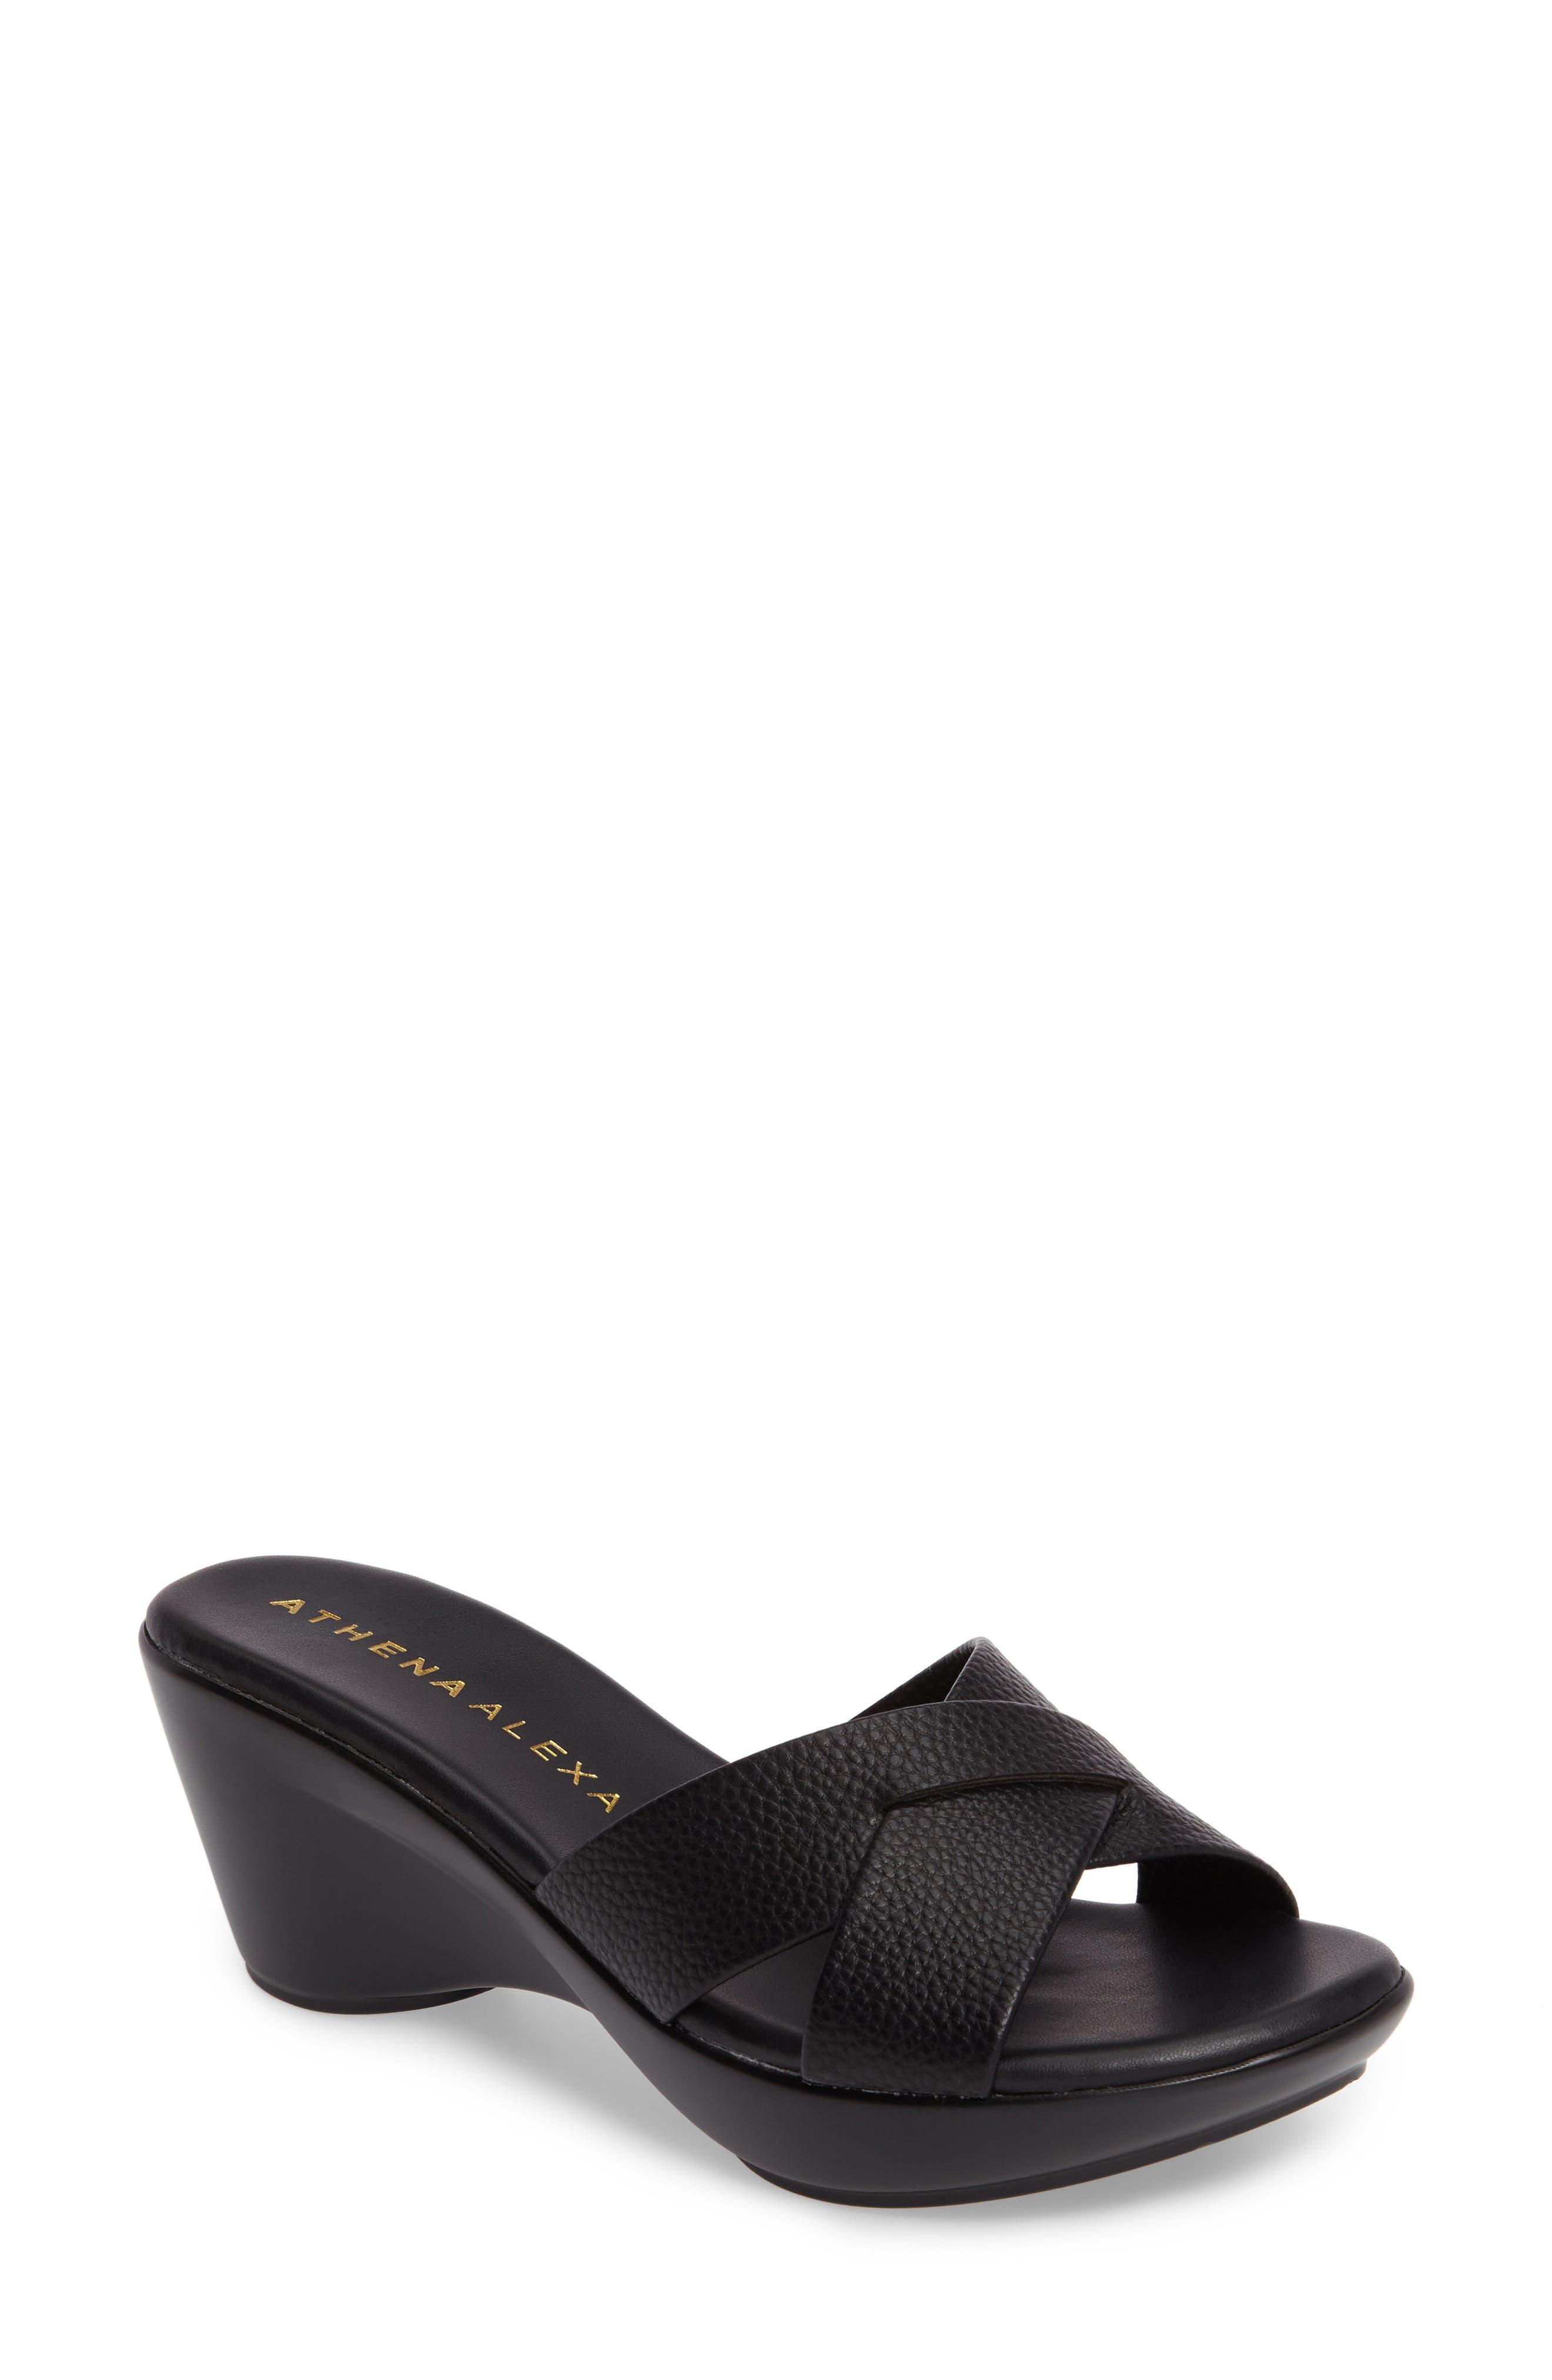 Verna Wedge Slide Sandal,                         Main,                         color, 001